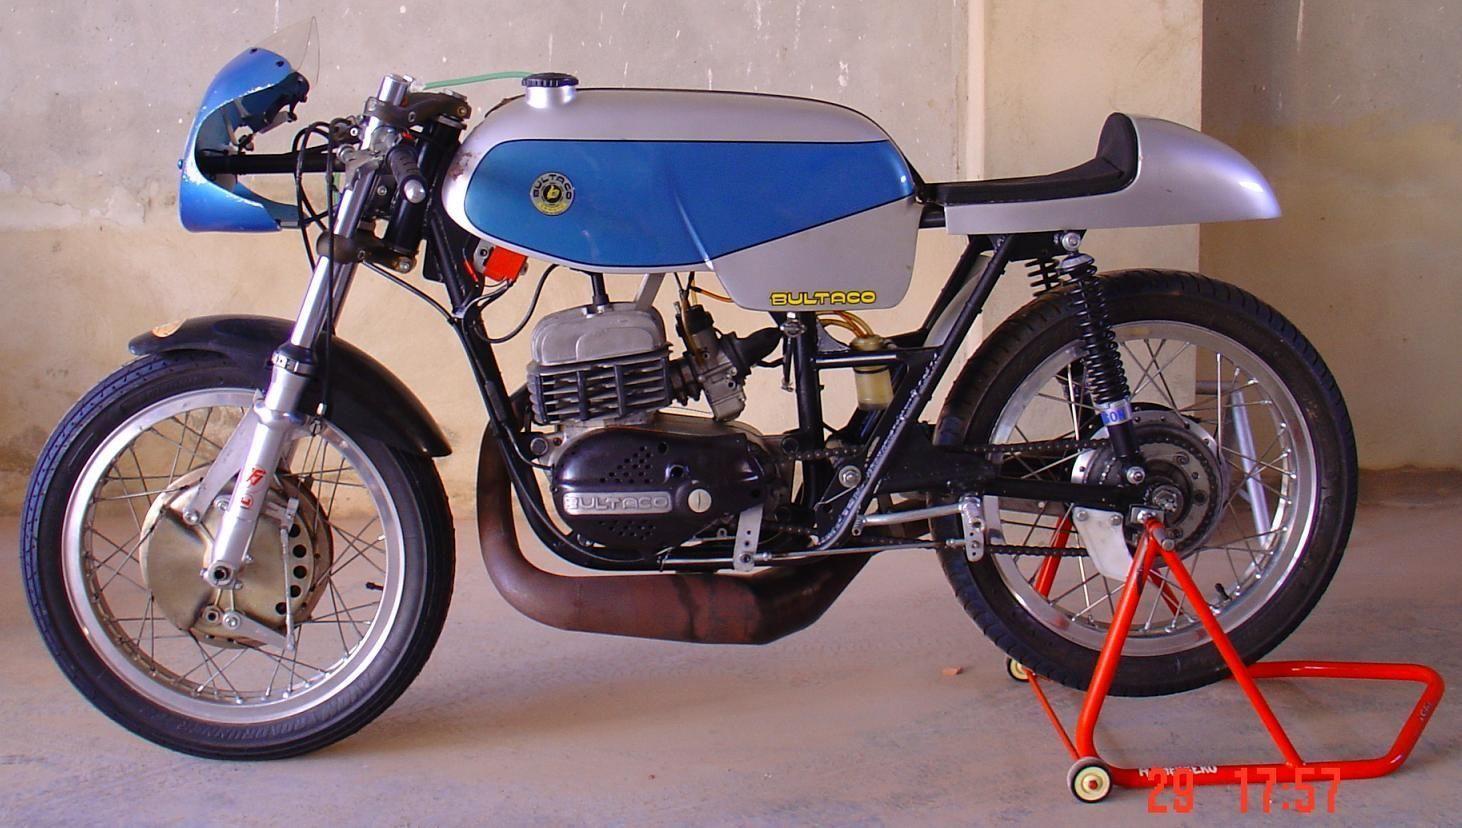 Cúpula de Fibra estilo Bultaco Carreras Modelo CO03